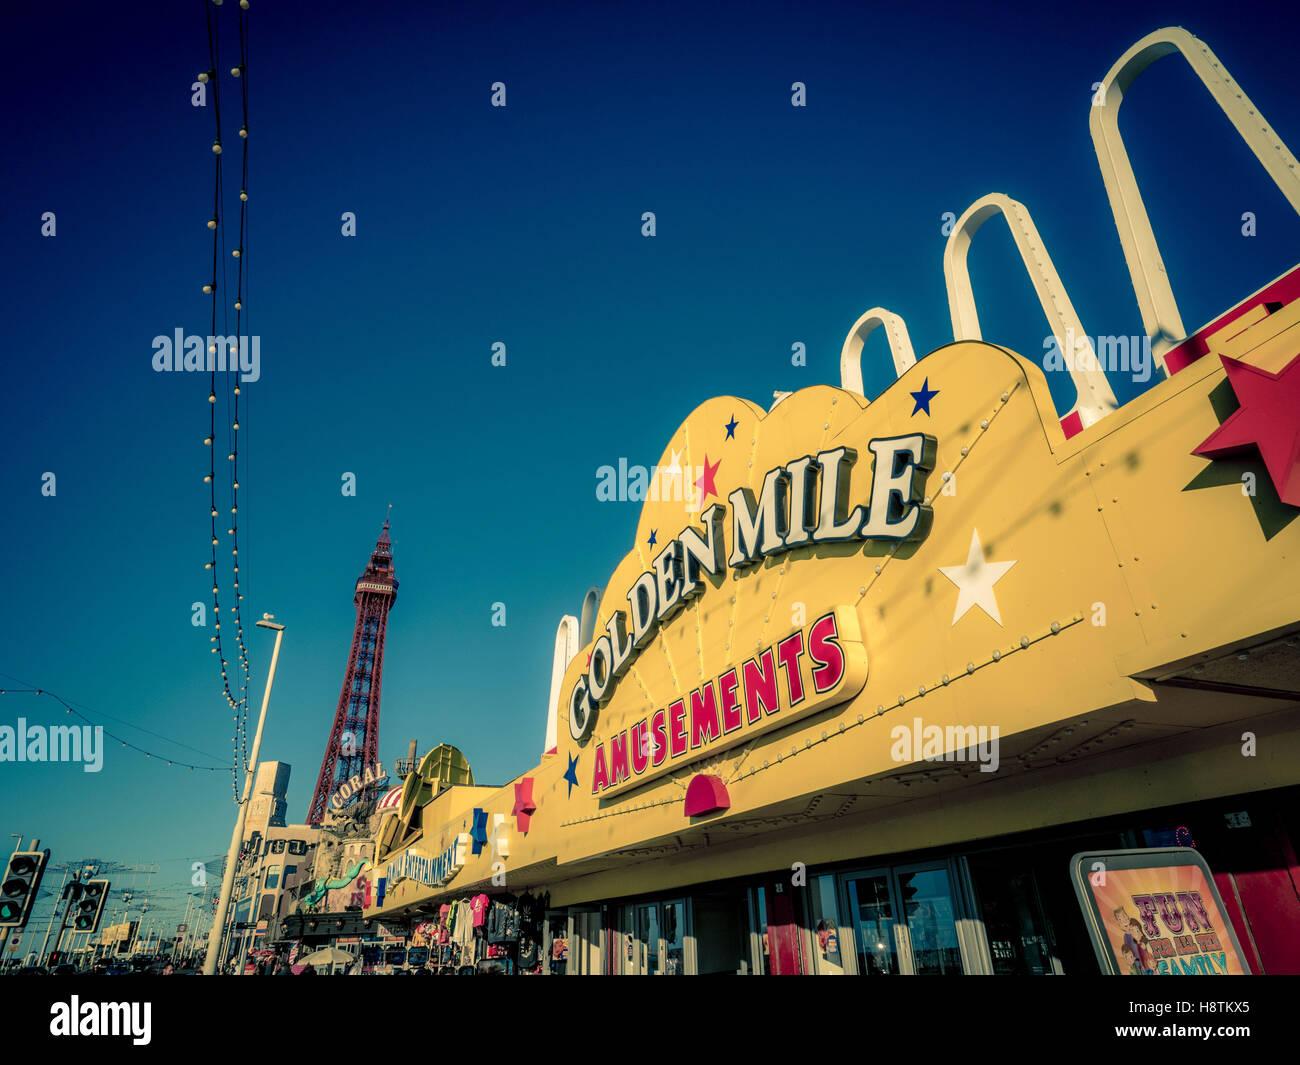 Golden Mile Amusement Arcade sign on seafront, Blackpool, Lancashire, UK. - Stock Image